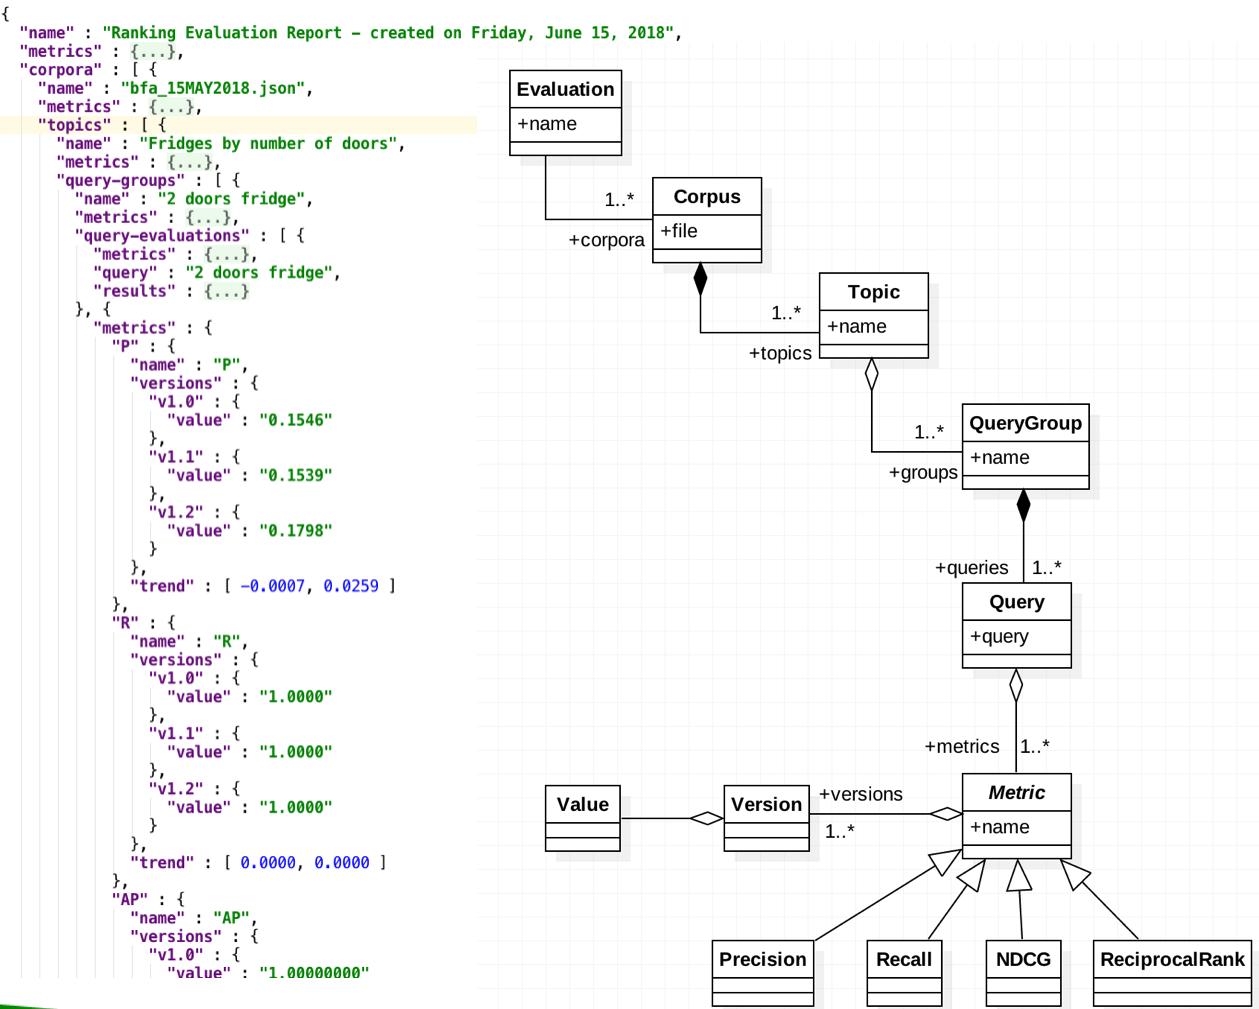 evaluation_output